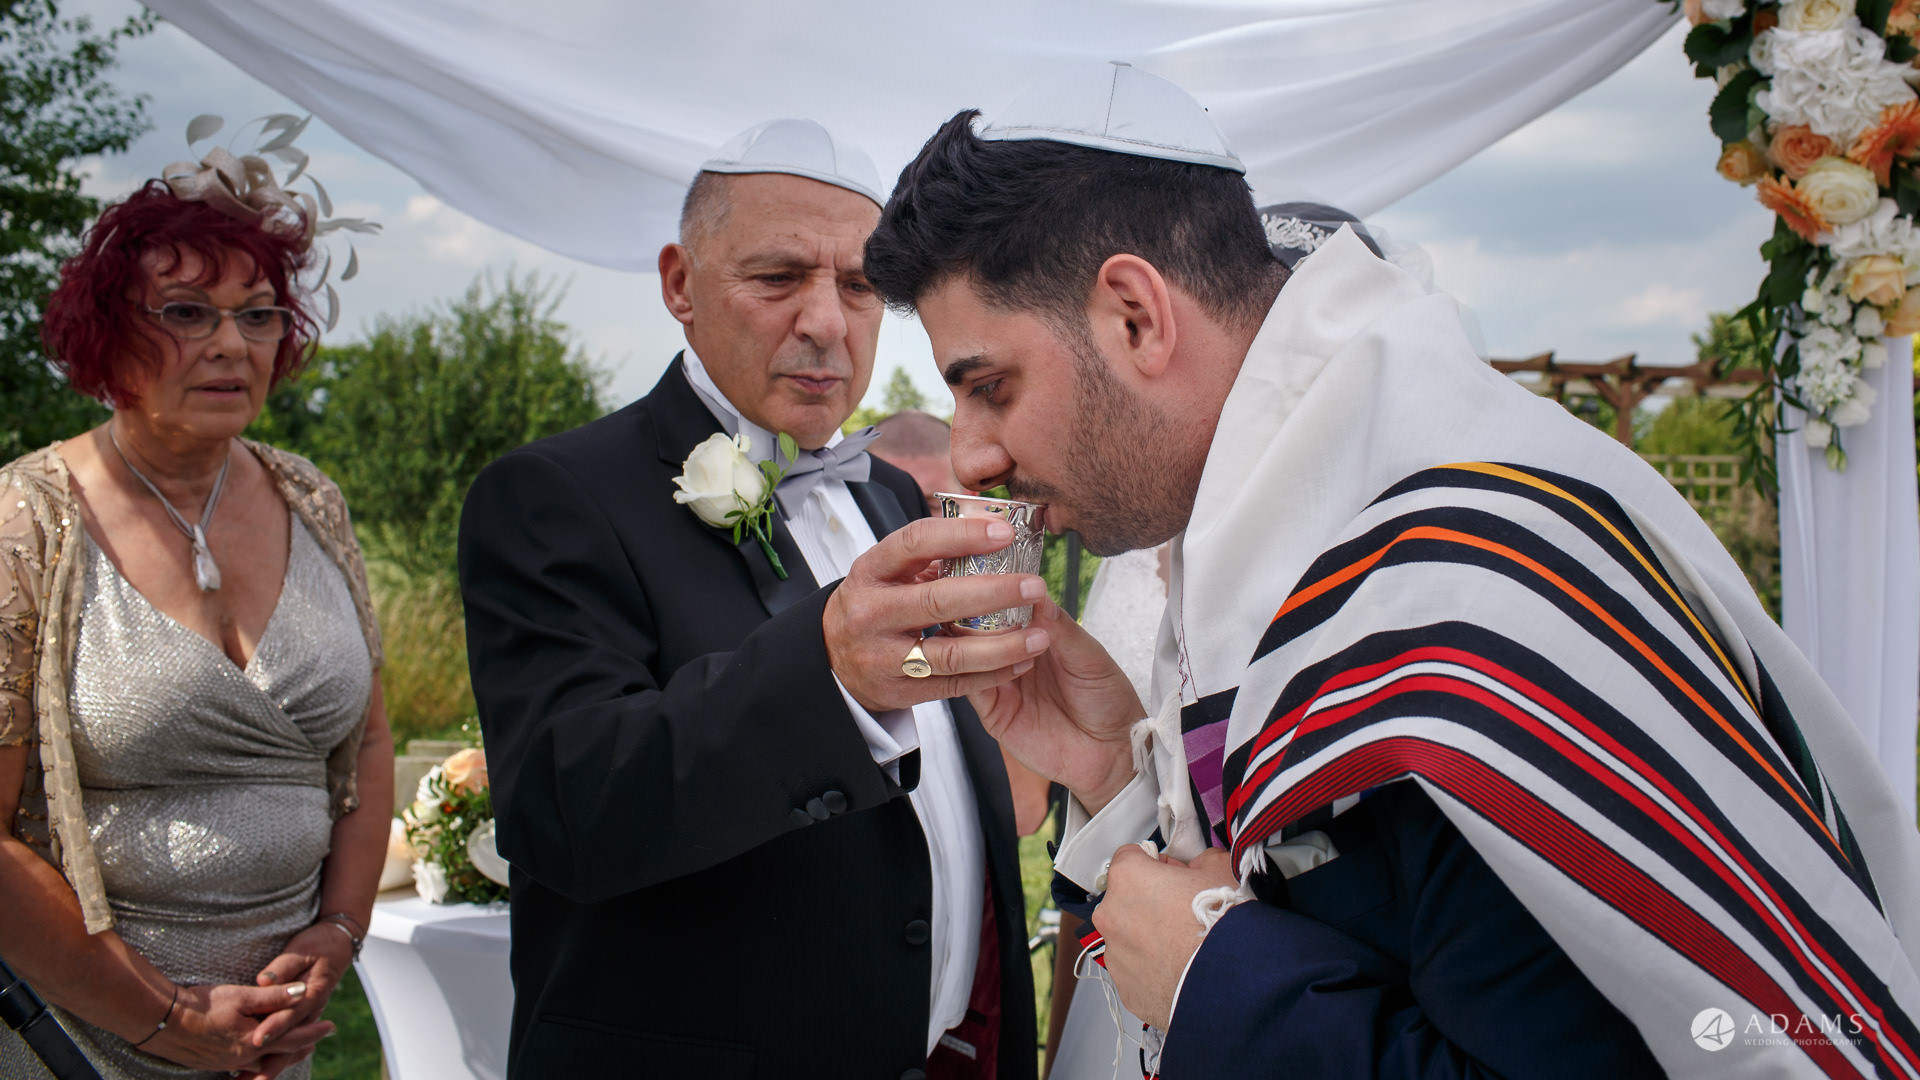 Jewish Wedding at Manor of Groves Wedding Photography   Candice + Doron 88